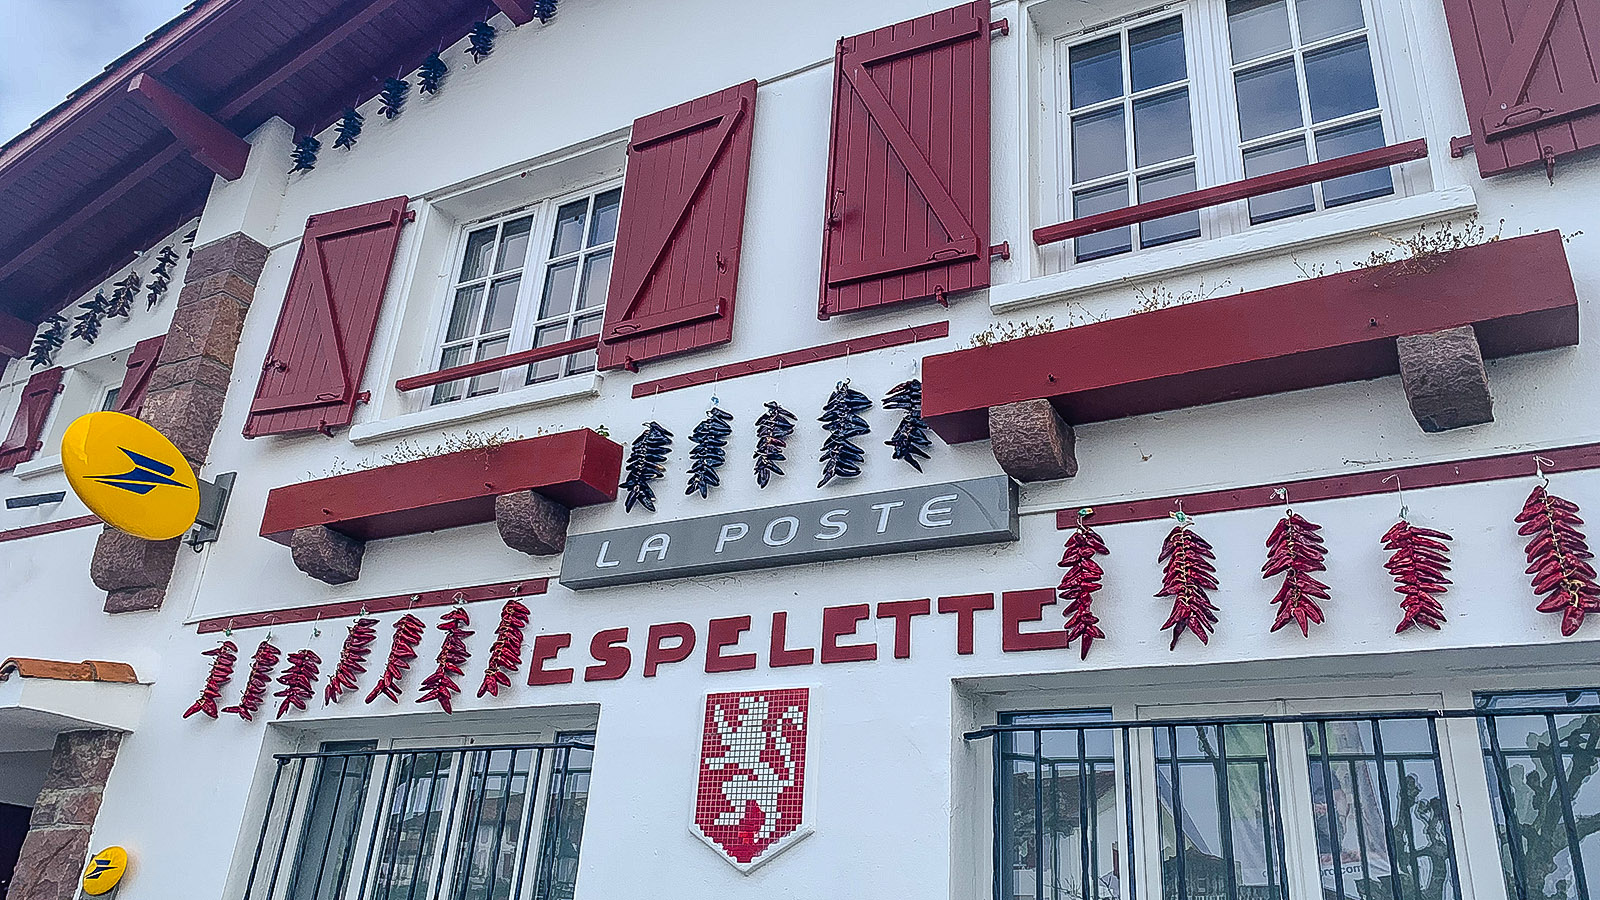 Selbst die Post schmückt der Piment d'Espelette. Foto: Hilke Maunder